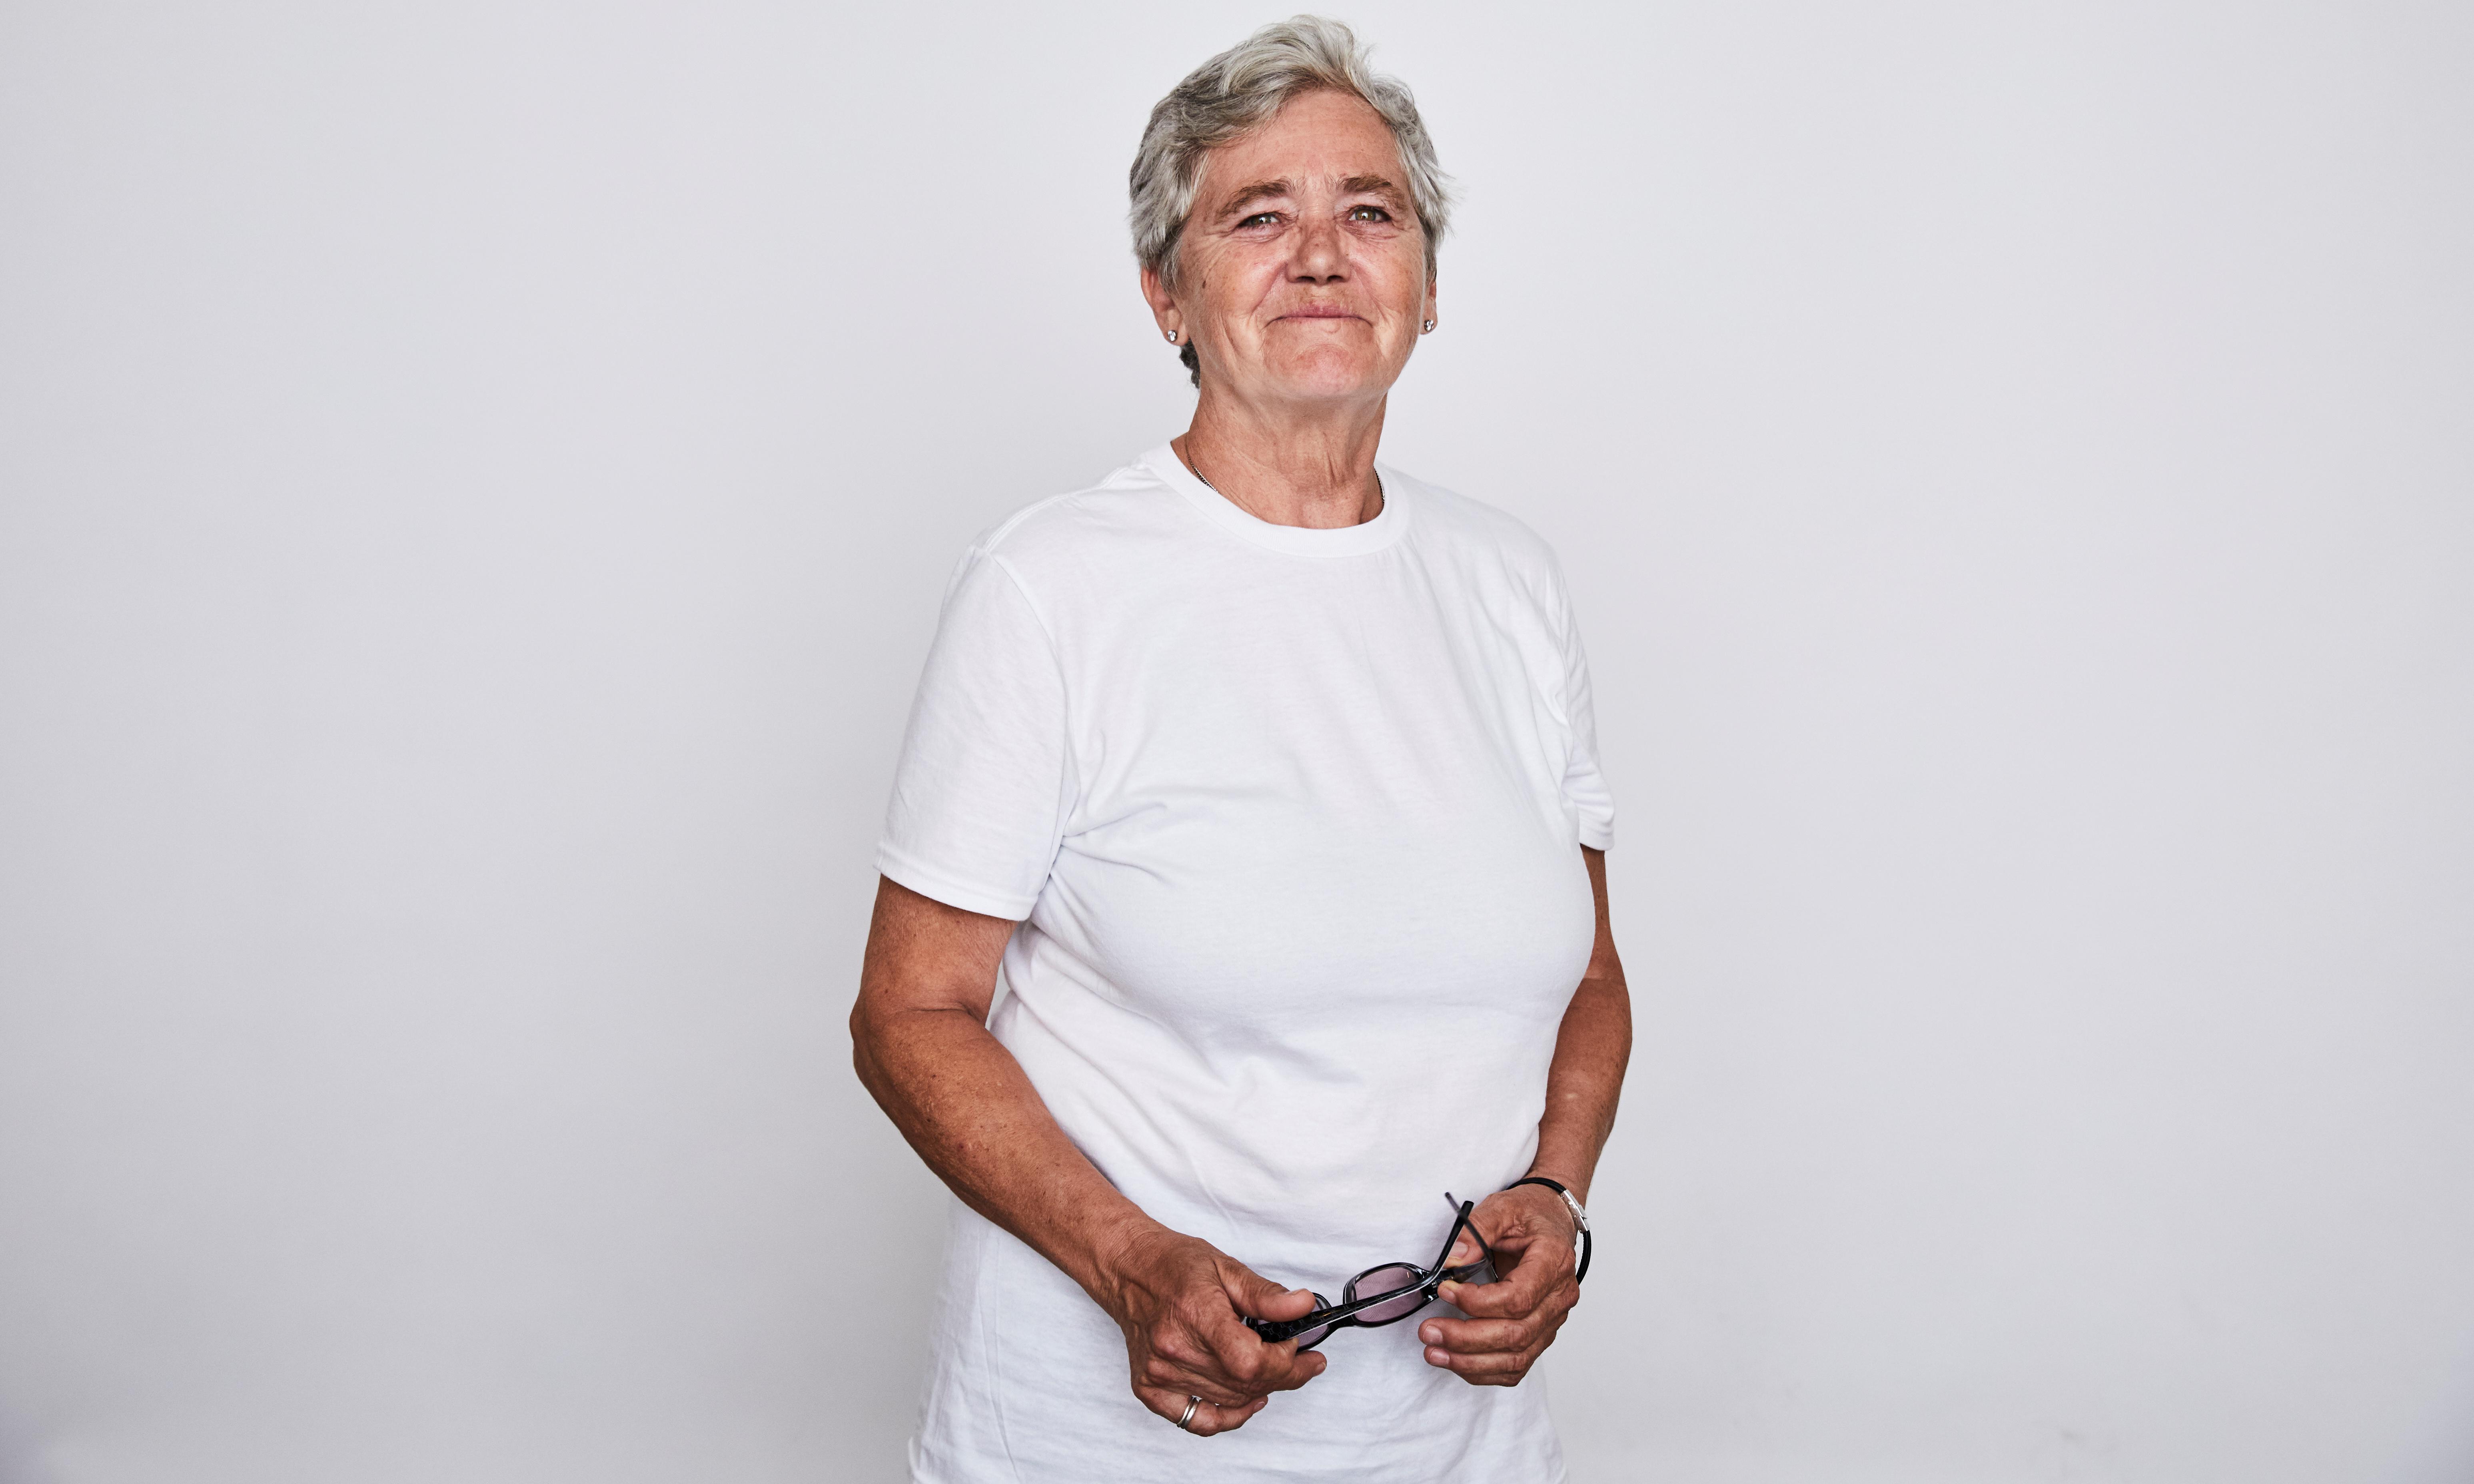 'I'm Ikea's first female carpenter in the UK and I love it'